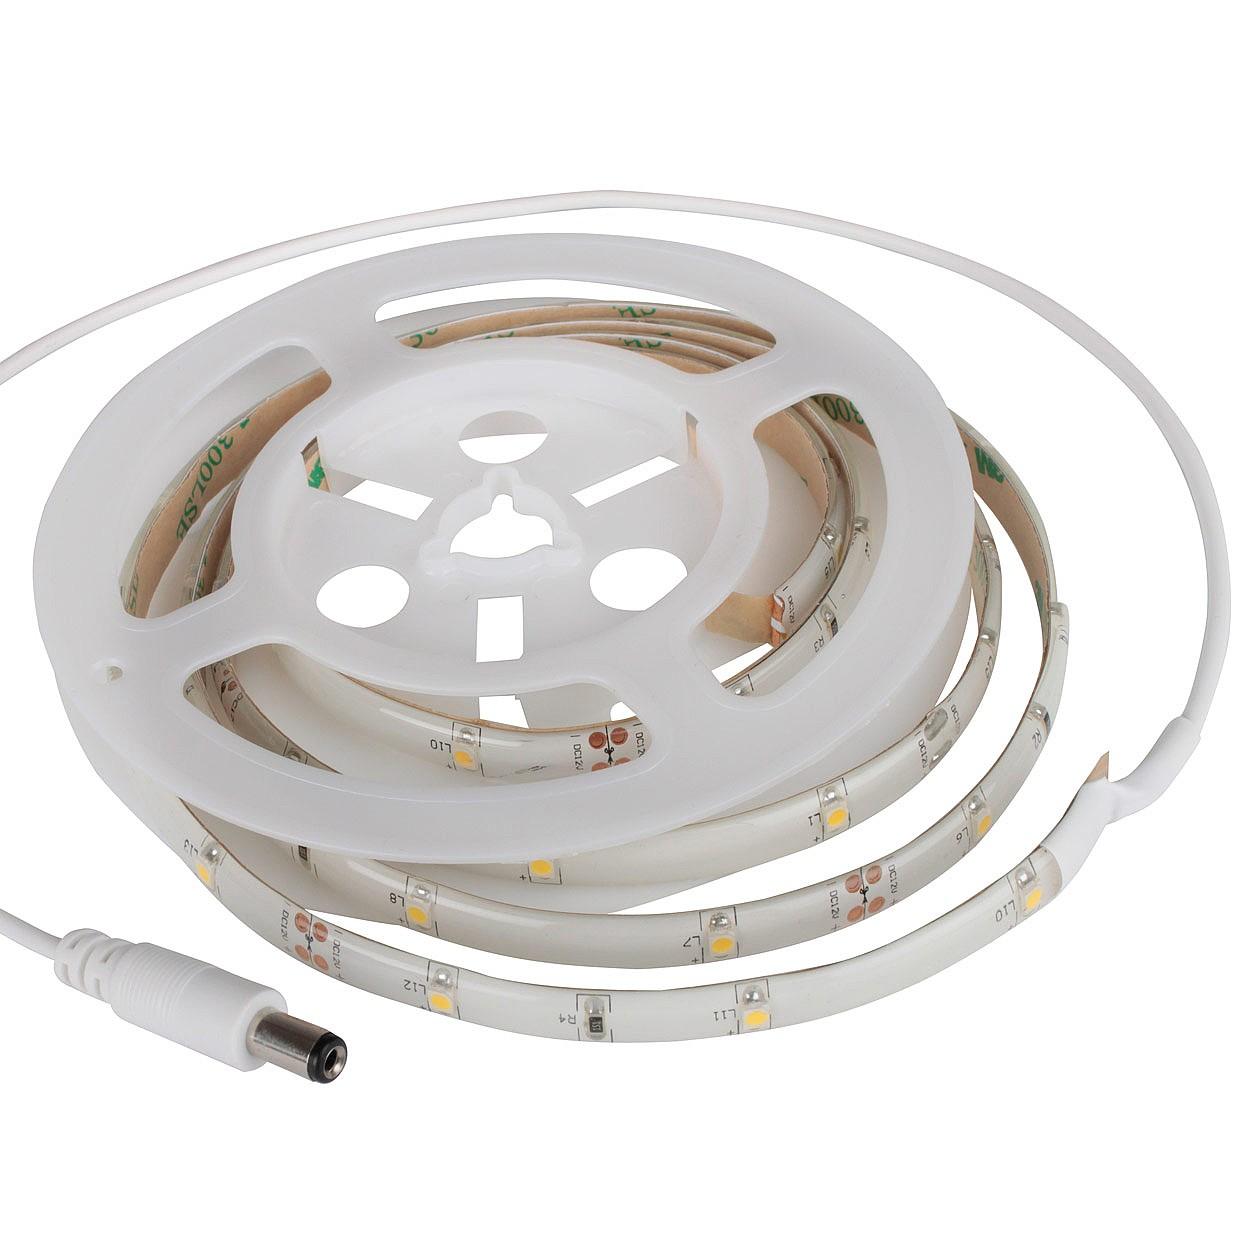 Image of Sensor Strip Light